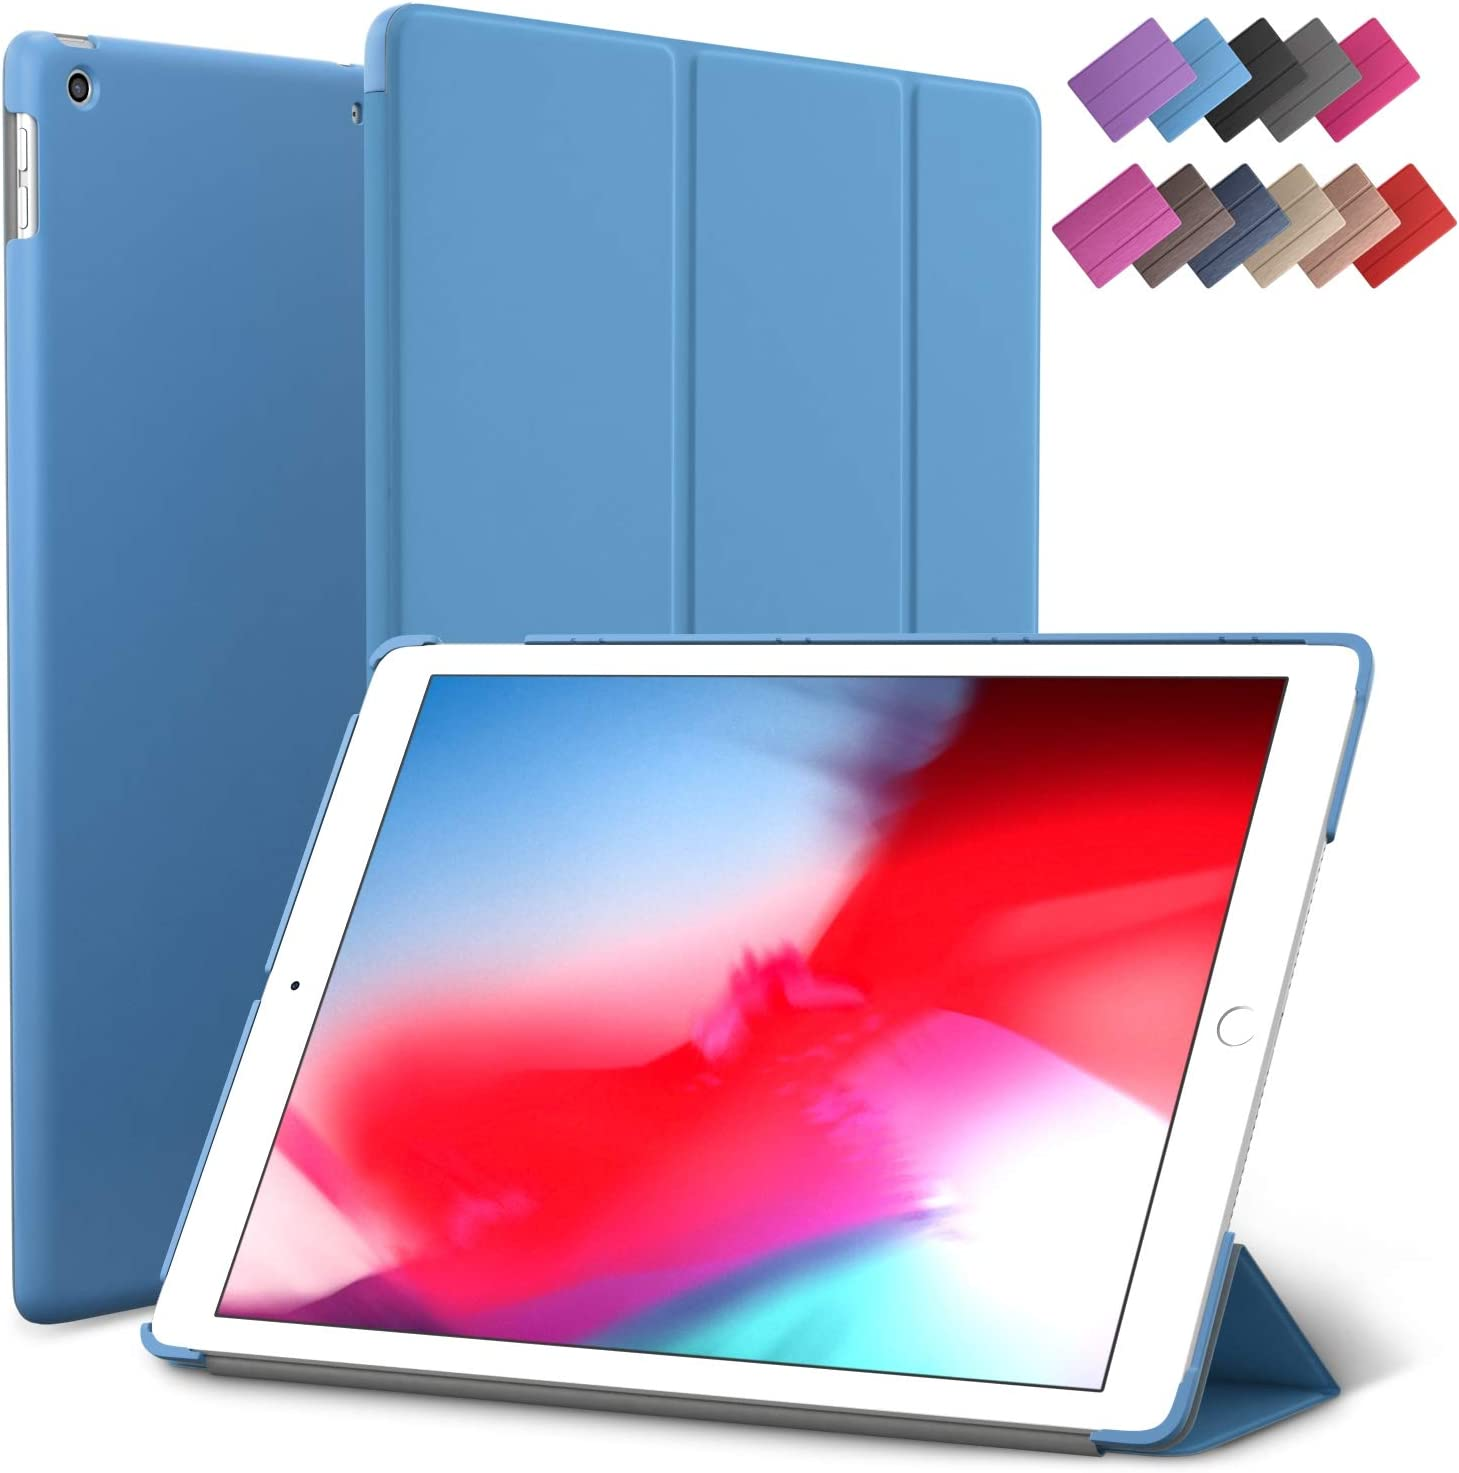 iPad Mini 5 case, ROARTZ Blue Slim Fit Smart Rubber Coated Folio Case Hard Cover Light-Weight Wake/Sleep for Apple iPad Mini 5th Generation 2019 Model A2133 A2124 A2126 7.9-inch Display